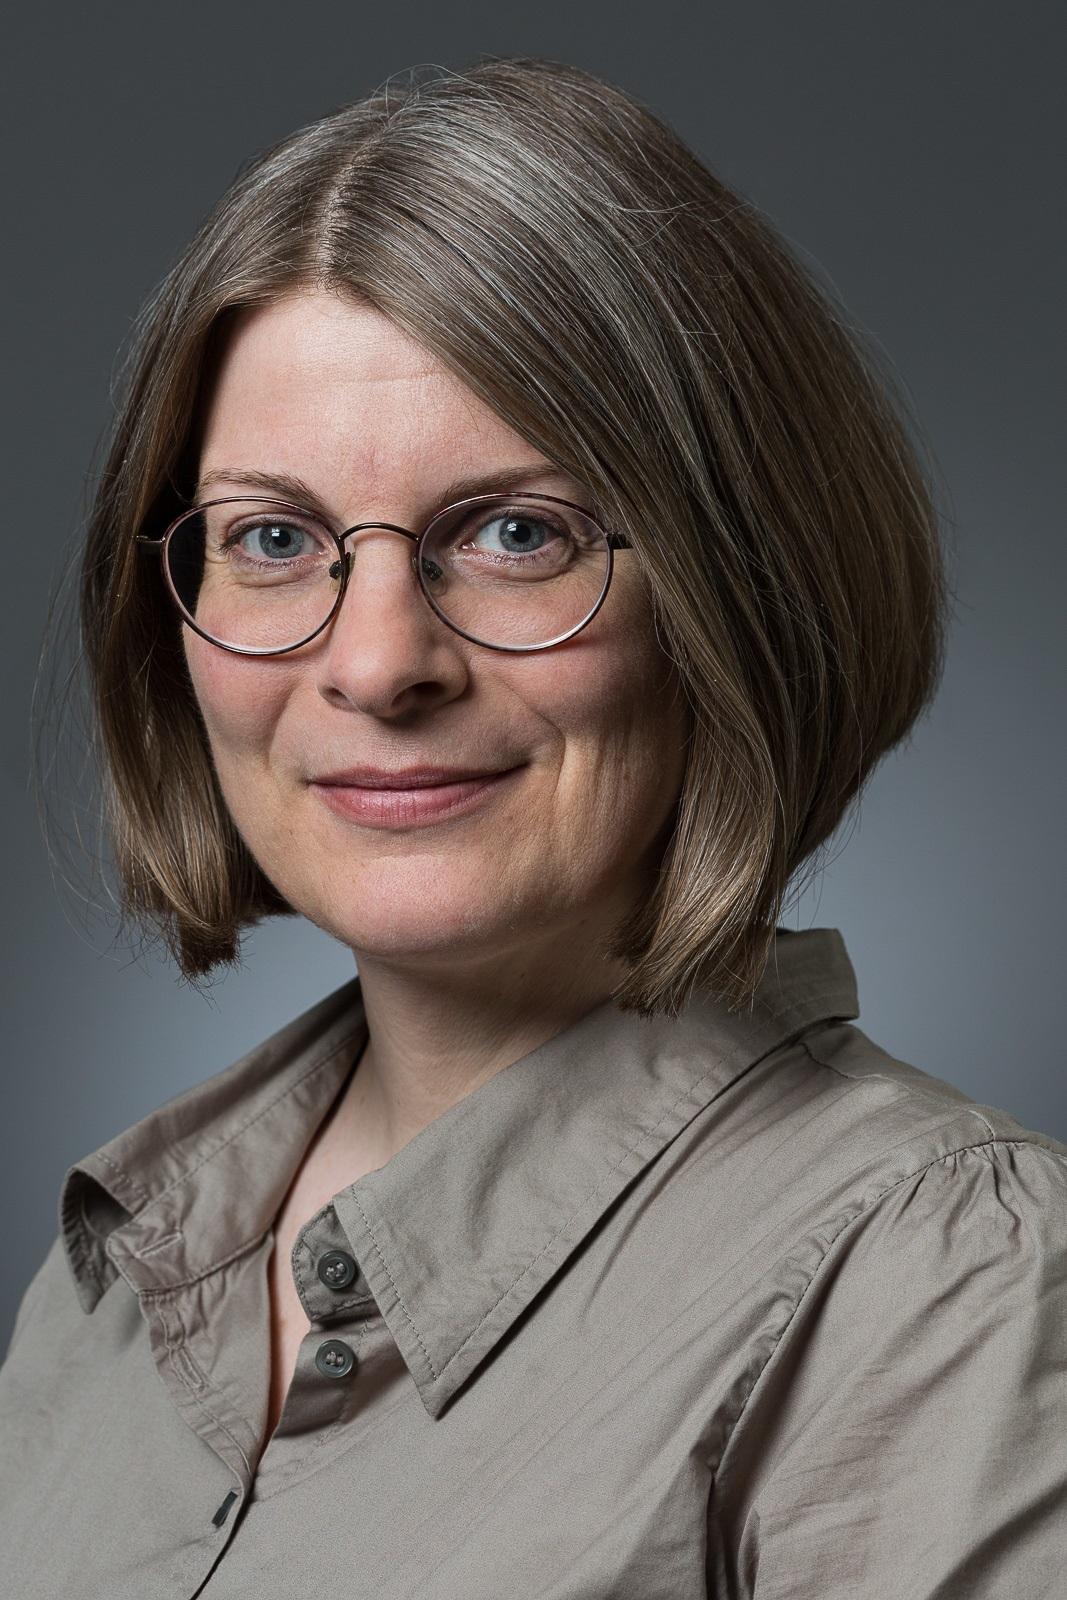 Inger H. Dalsgaard